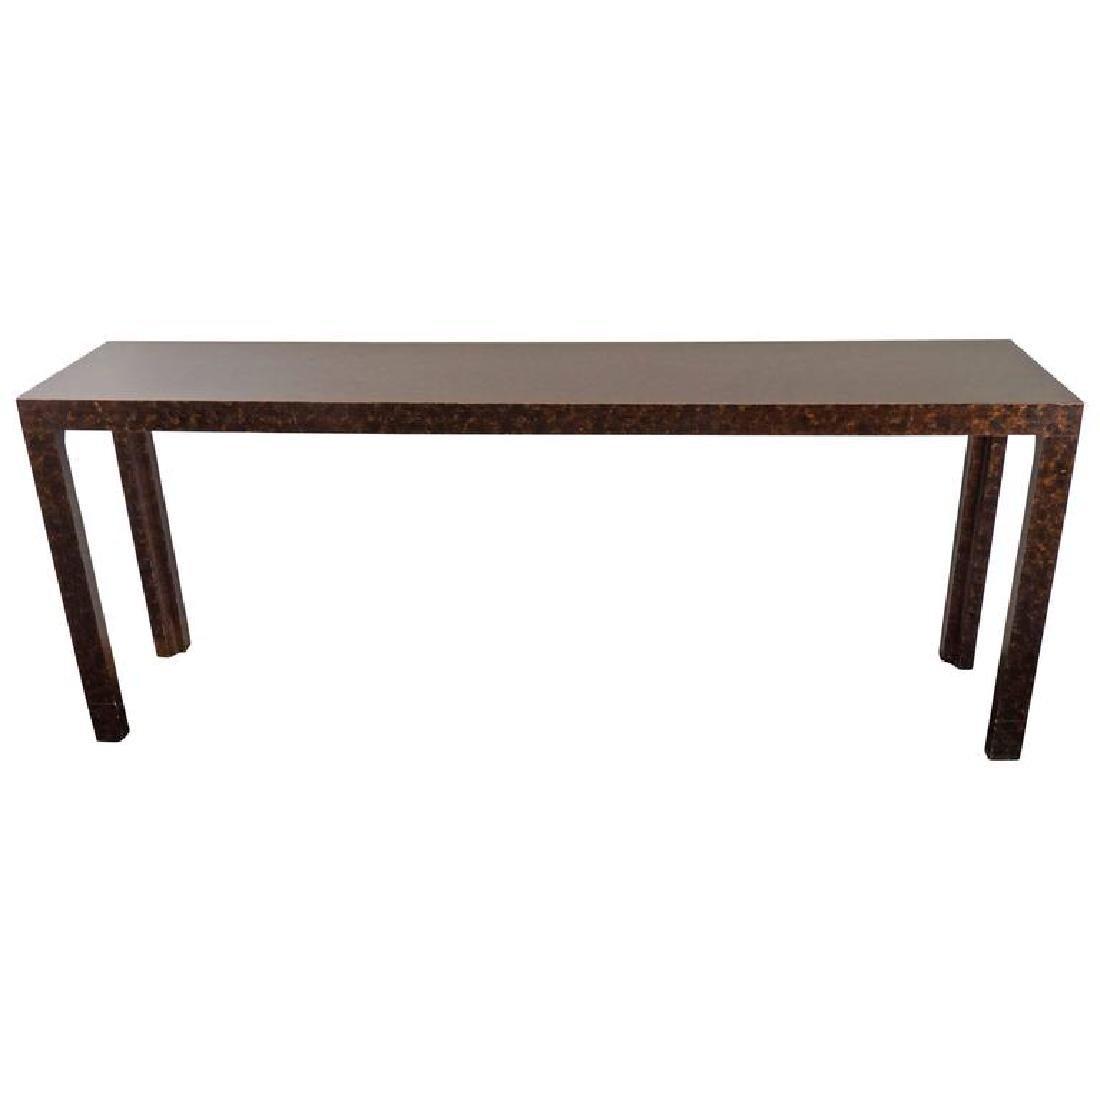 John Widdicomb Parsons Console Table, circa 1960